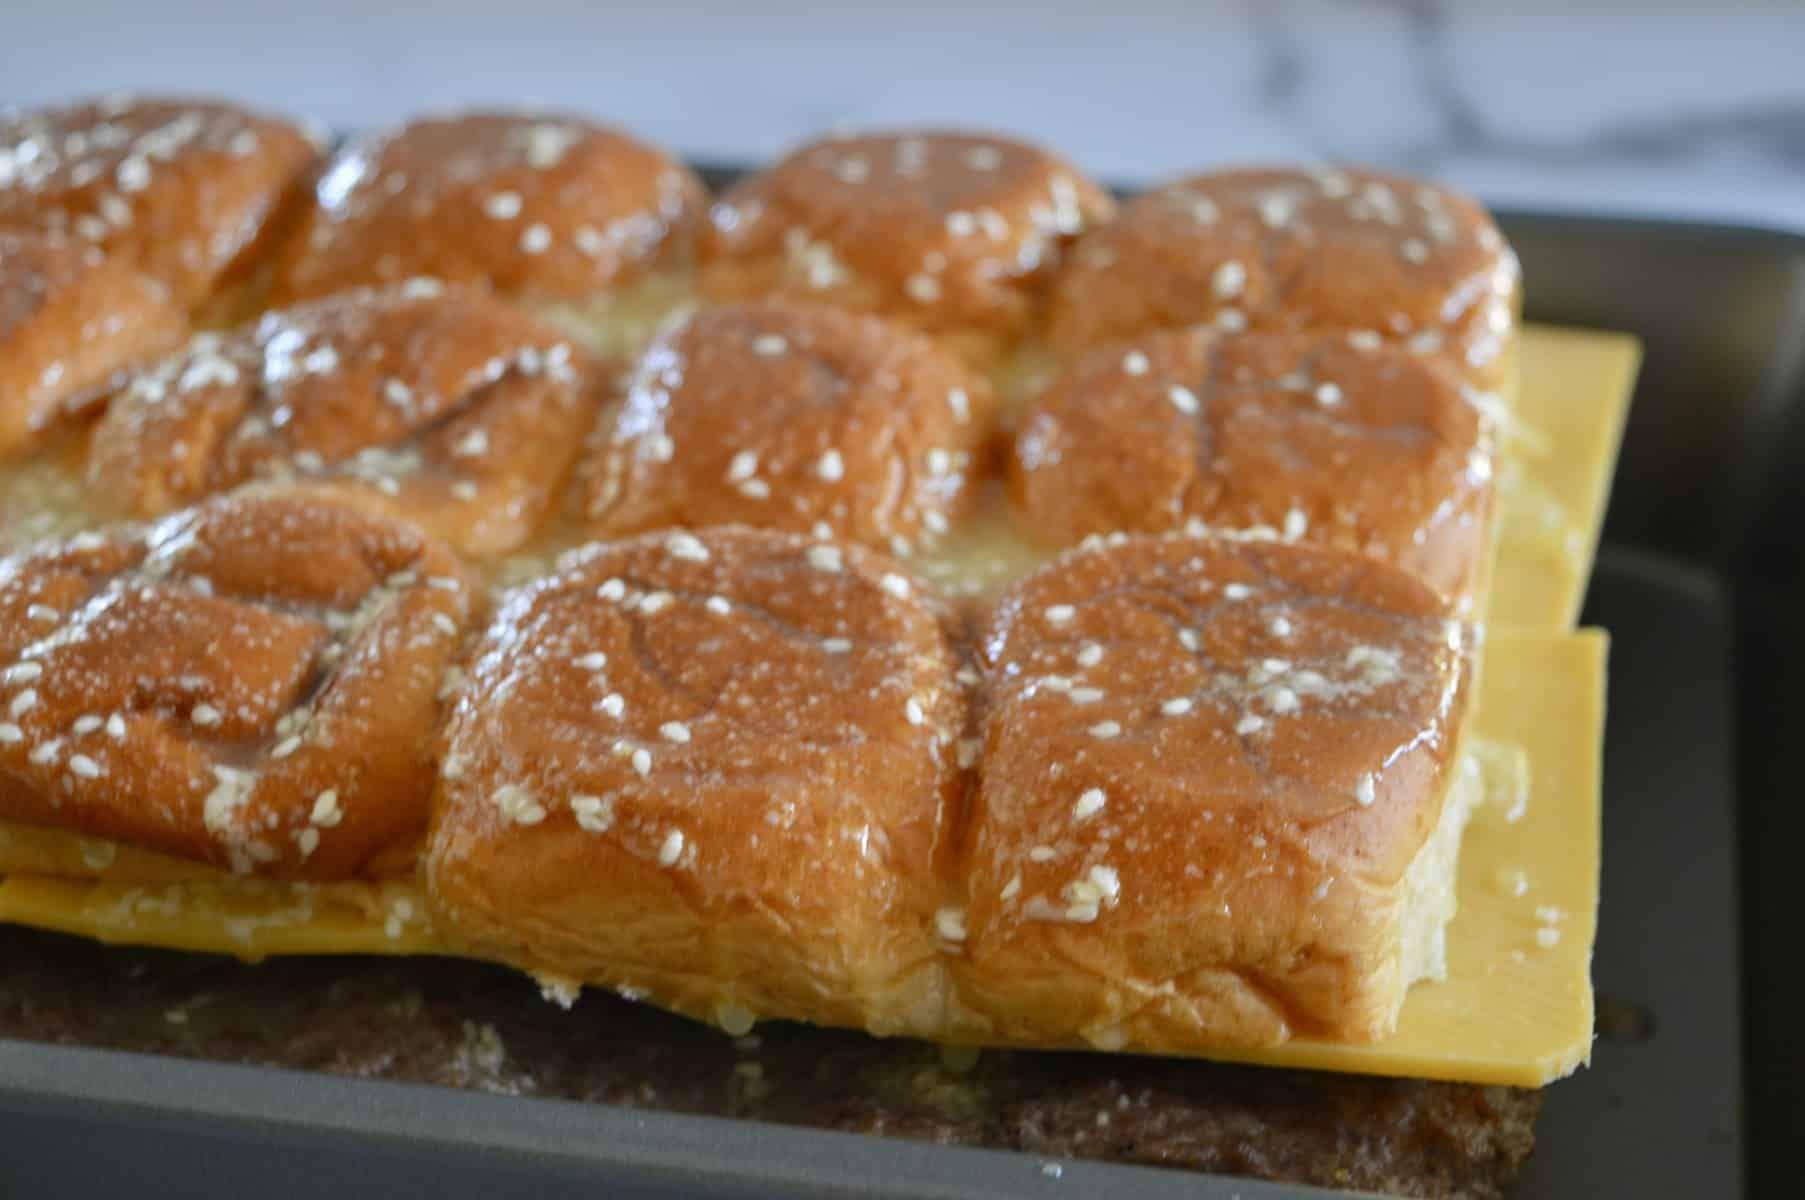 Easy Baked Cheeseburger Sliders #breakfastslidershawaiianrolls